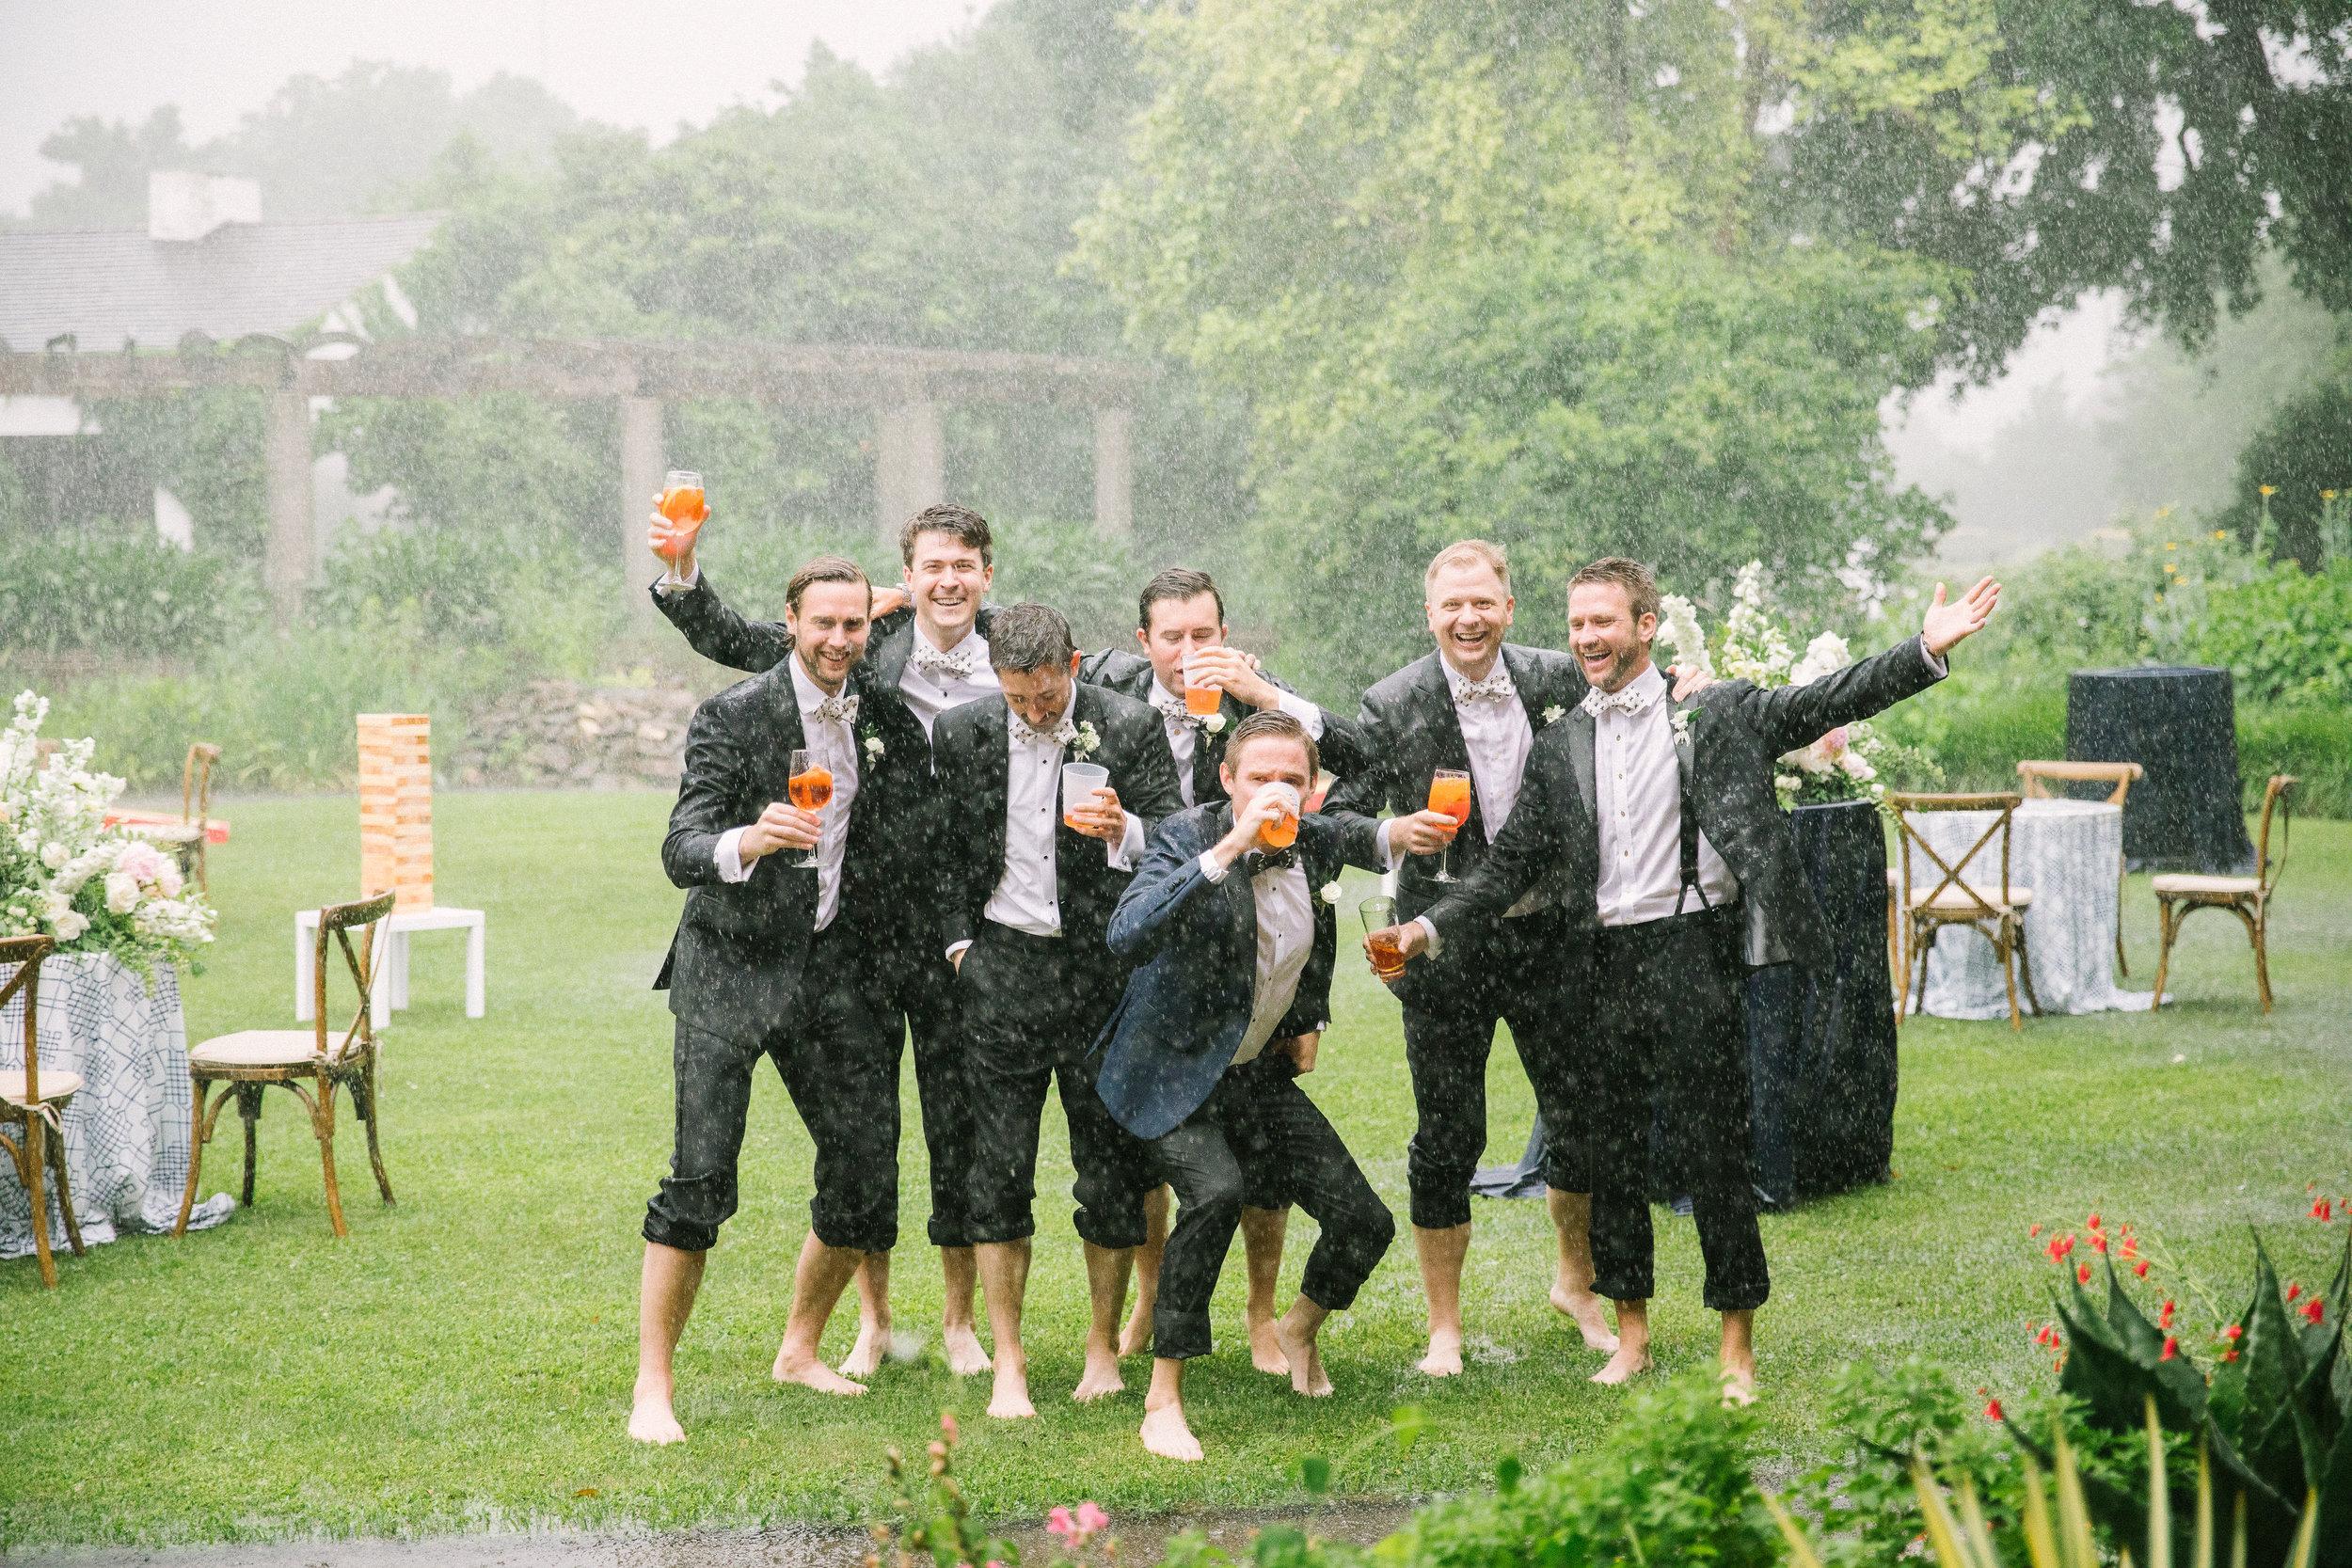 Jimmy-And-Groomsmen-In-Rain-Ivory-and-Vine.jpg